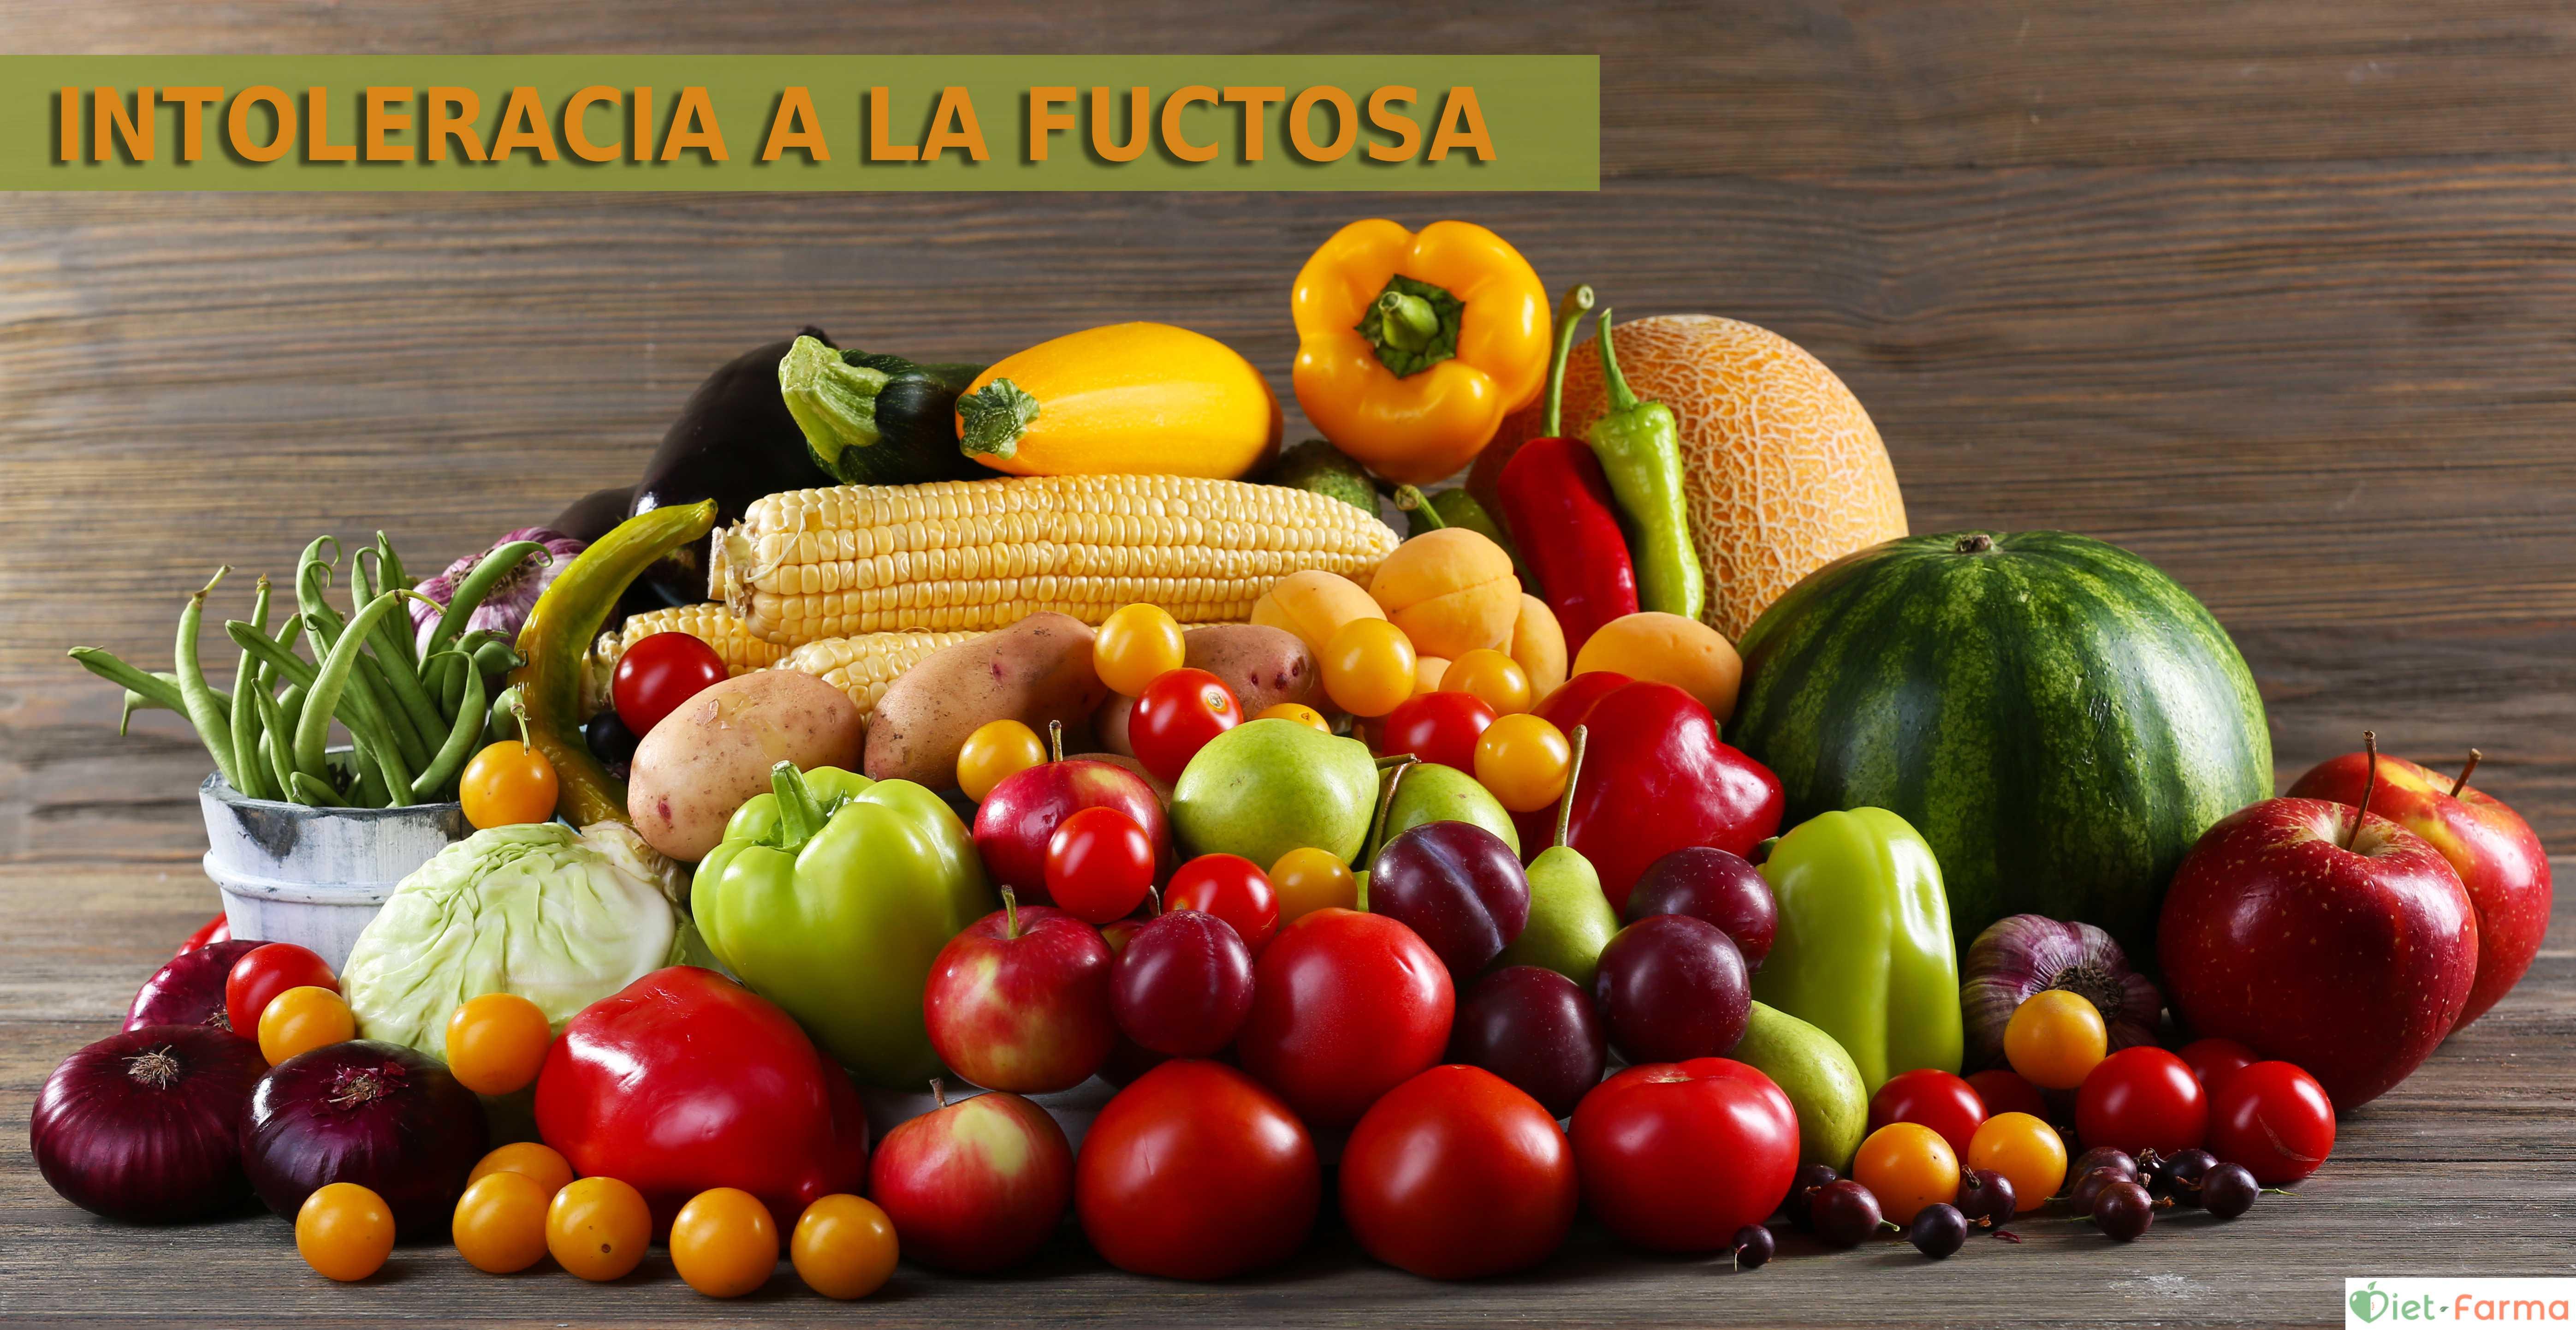 Dieta para la intolerancia a la fructosa